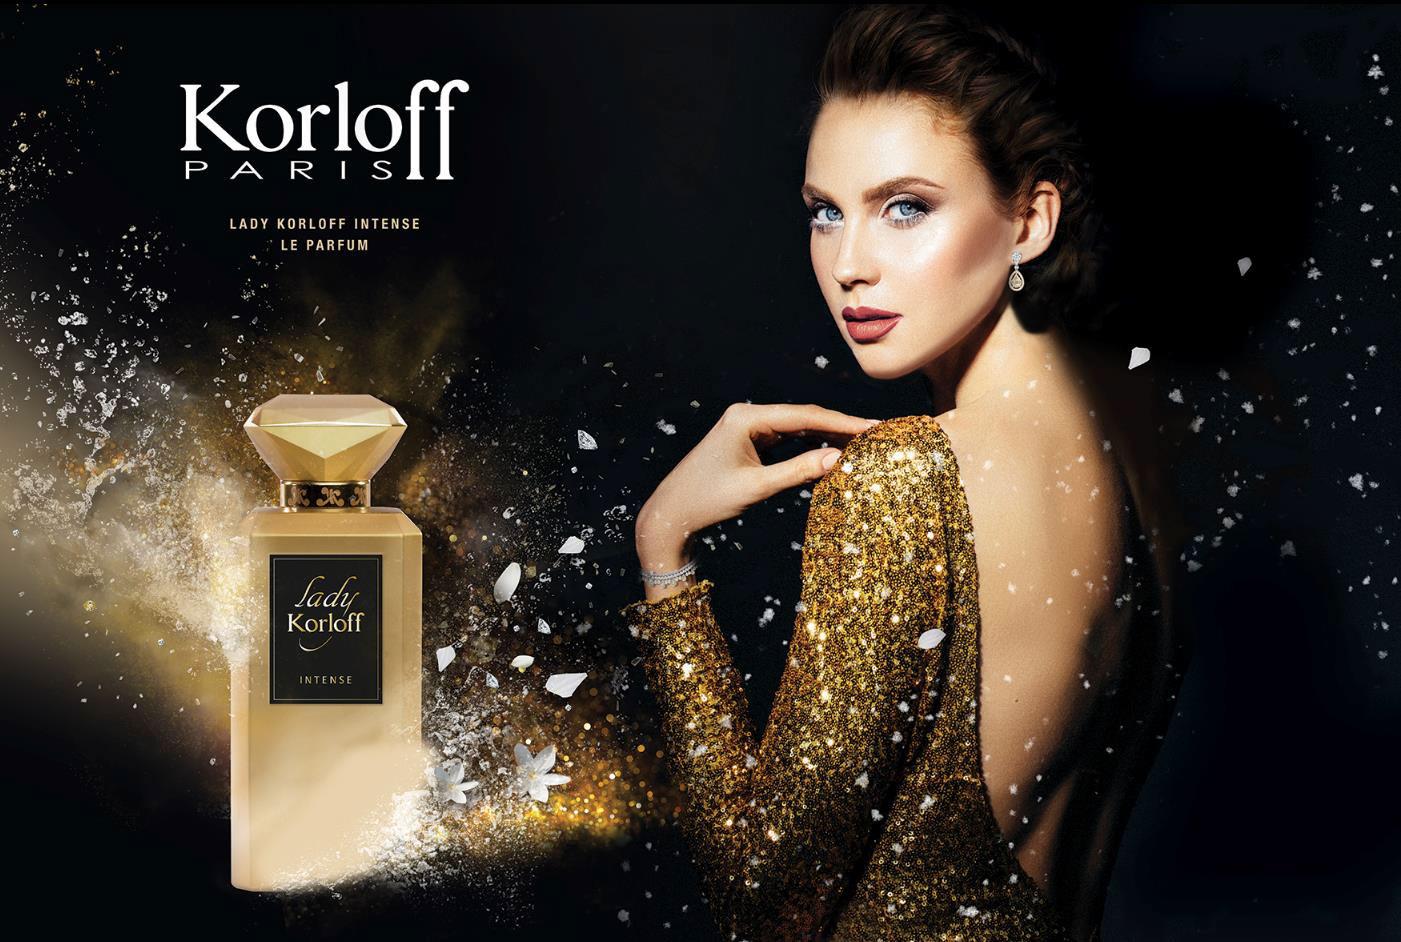 Korloff Lady Korloff Intense